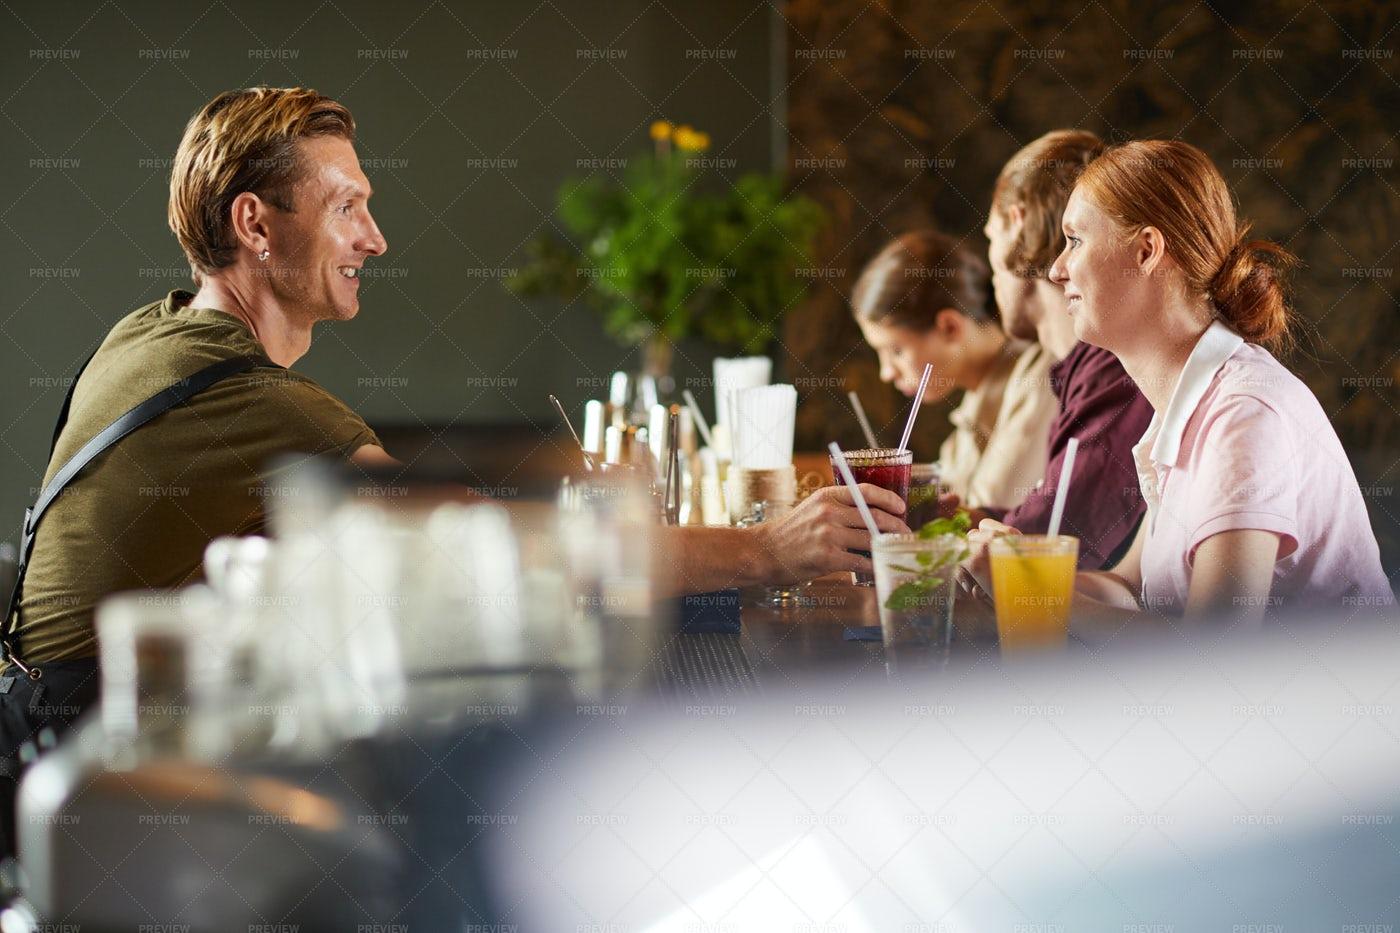 Young Couple Enjoying Date In Bar: Stock Photos